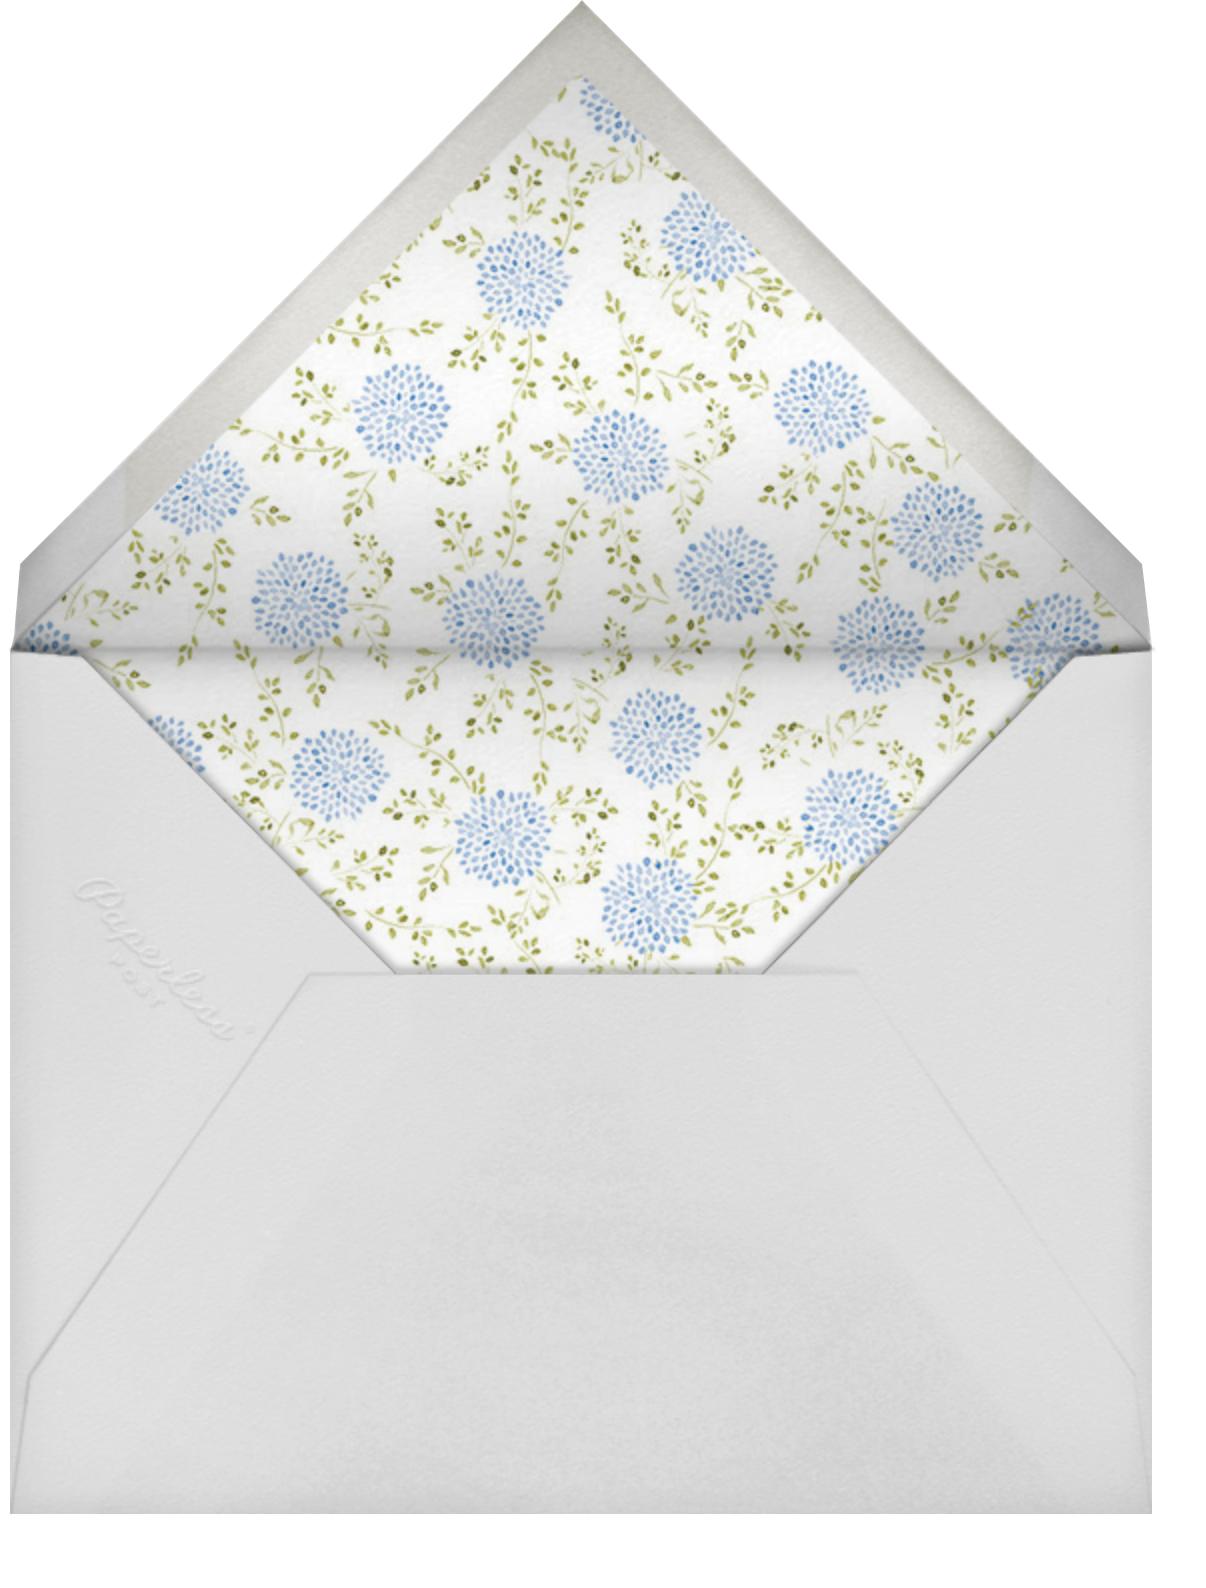 Dahlias (Photo) - Blue - Paperless Post - Engagement party - envelope back